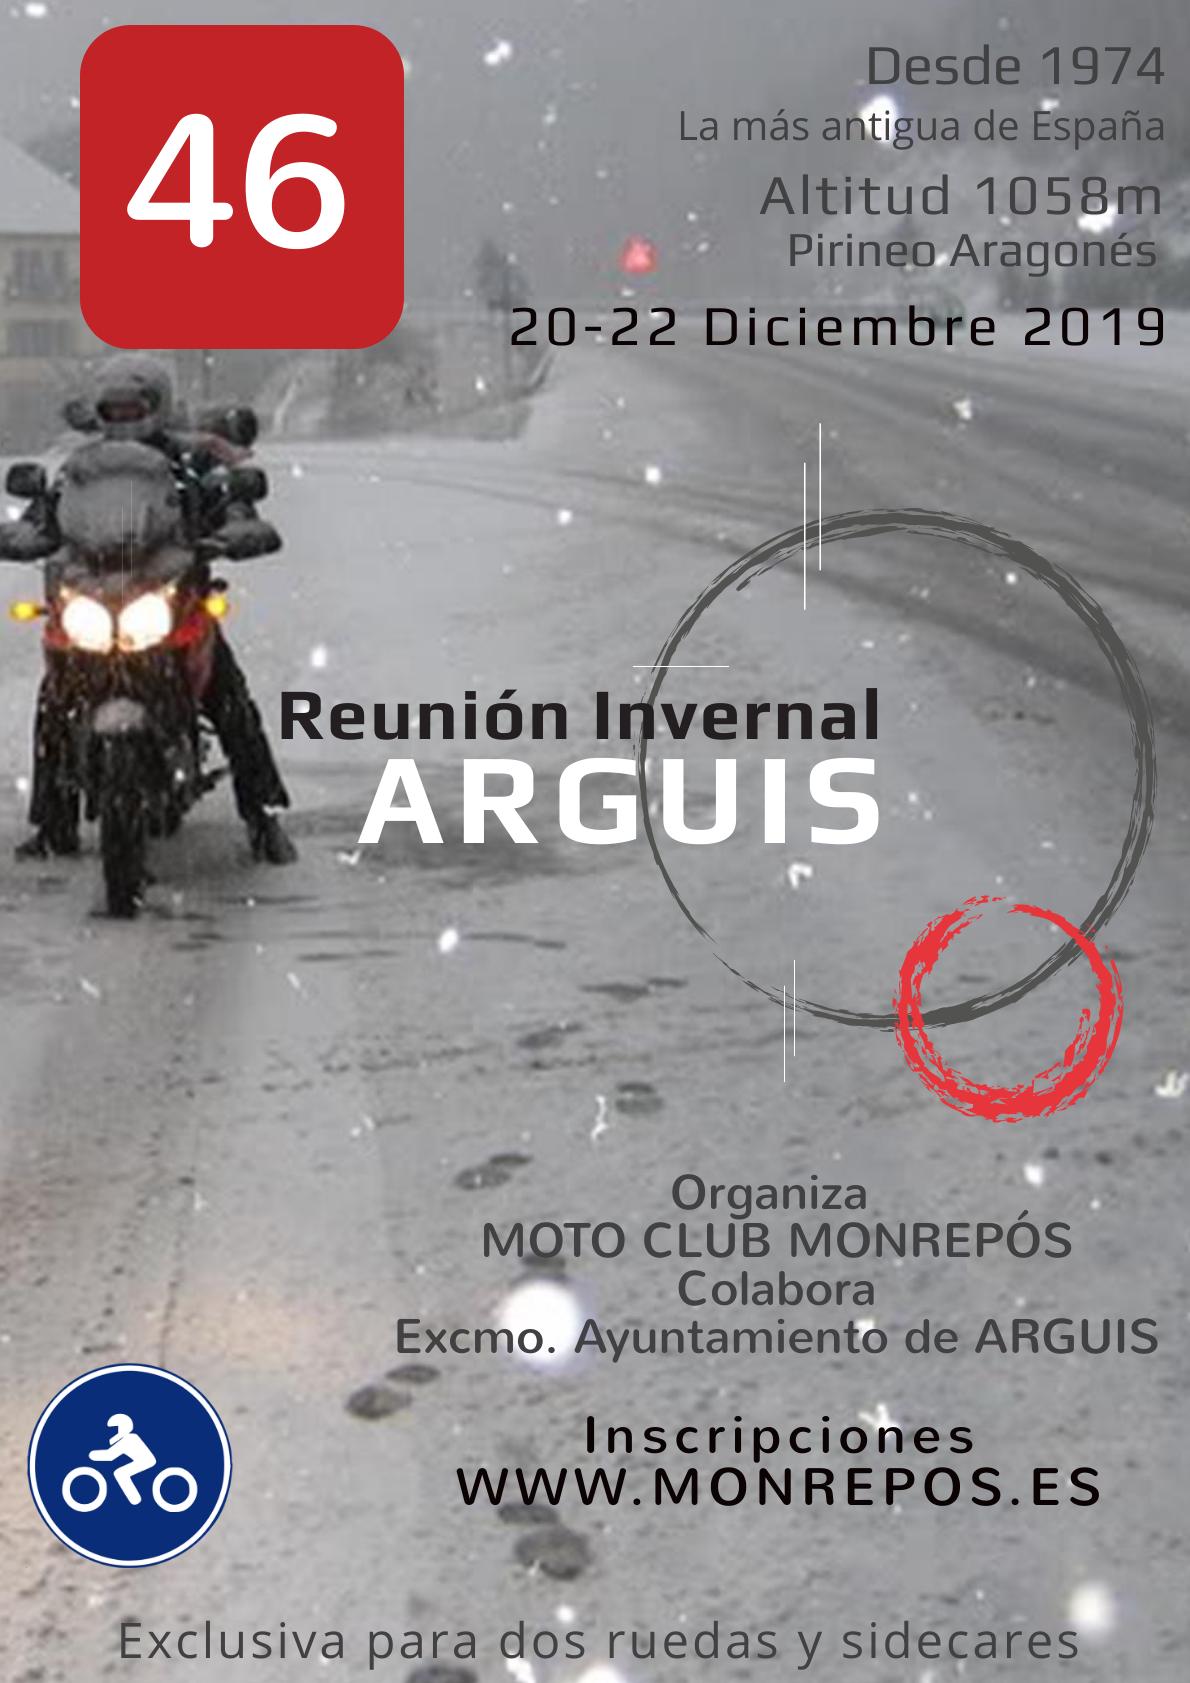 italiainpiega-motoraduni invernali-reunion invernal arguis 2019